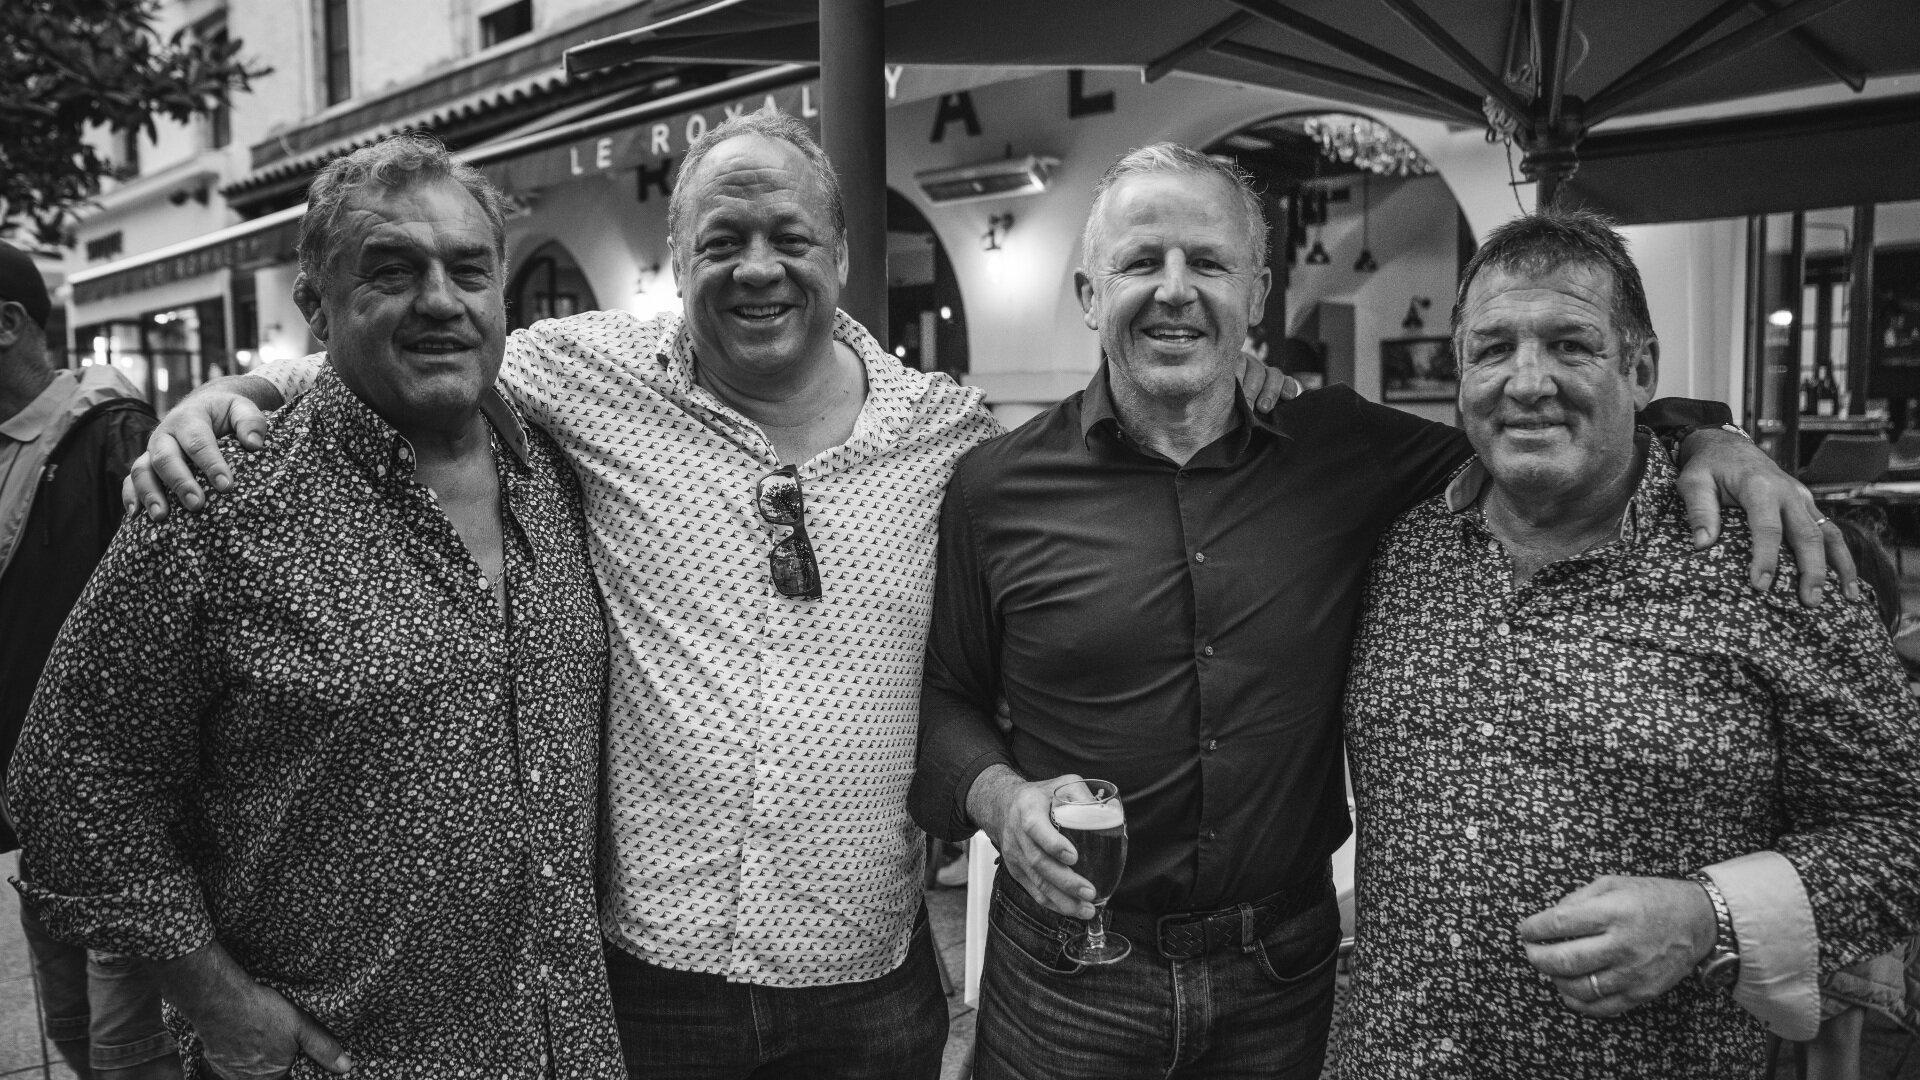 Philippe Dintrans, David Beresford, Sean Fitzpatrick, Pascal Ondarts